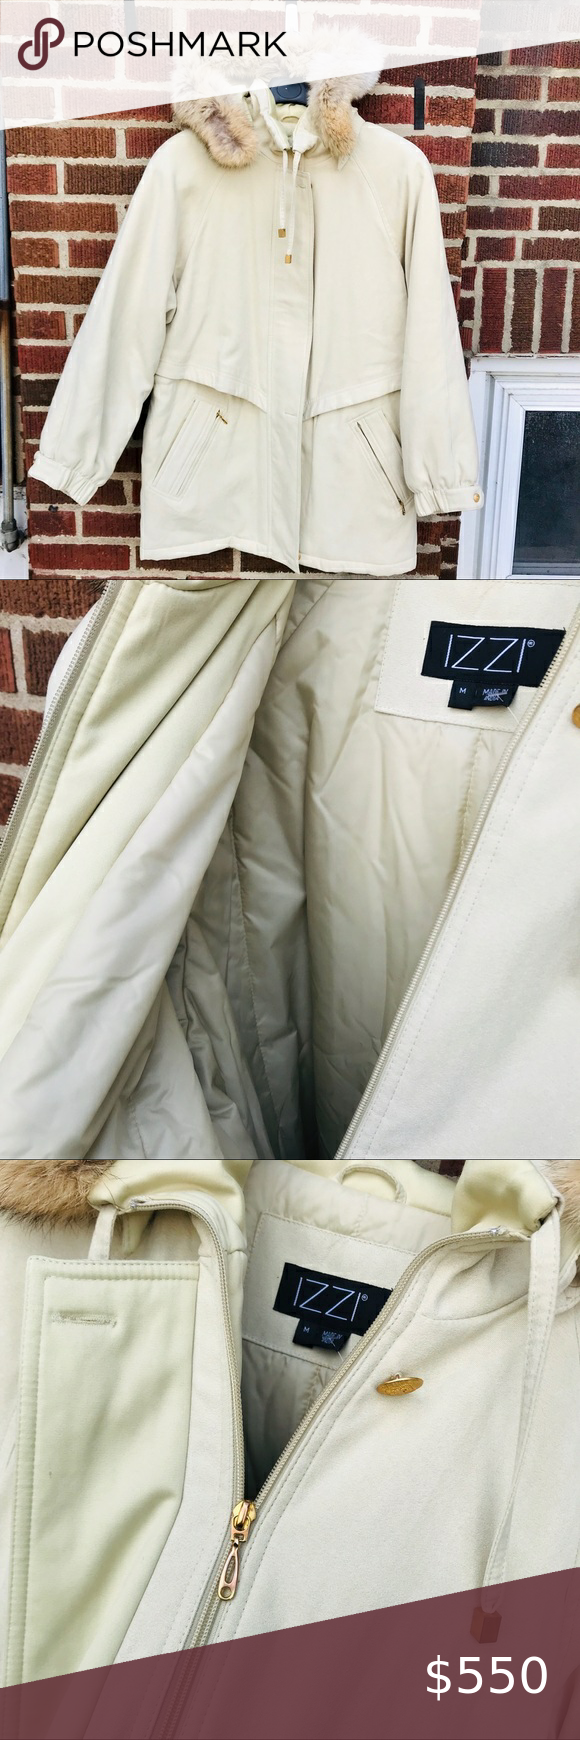 Vintage Izzi Real Fur Trim Down Puffer Win In 2021 Faux Fur Hooded Coat Long Puffer Coat Faux Fur Puffer Coat [ 1740 x 580 Pixel ]